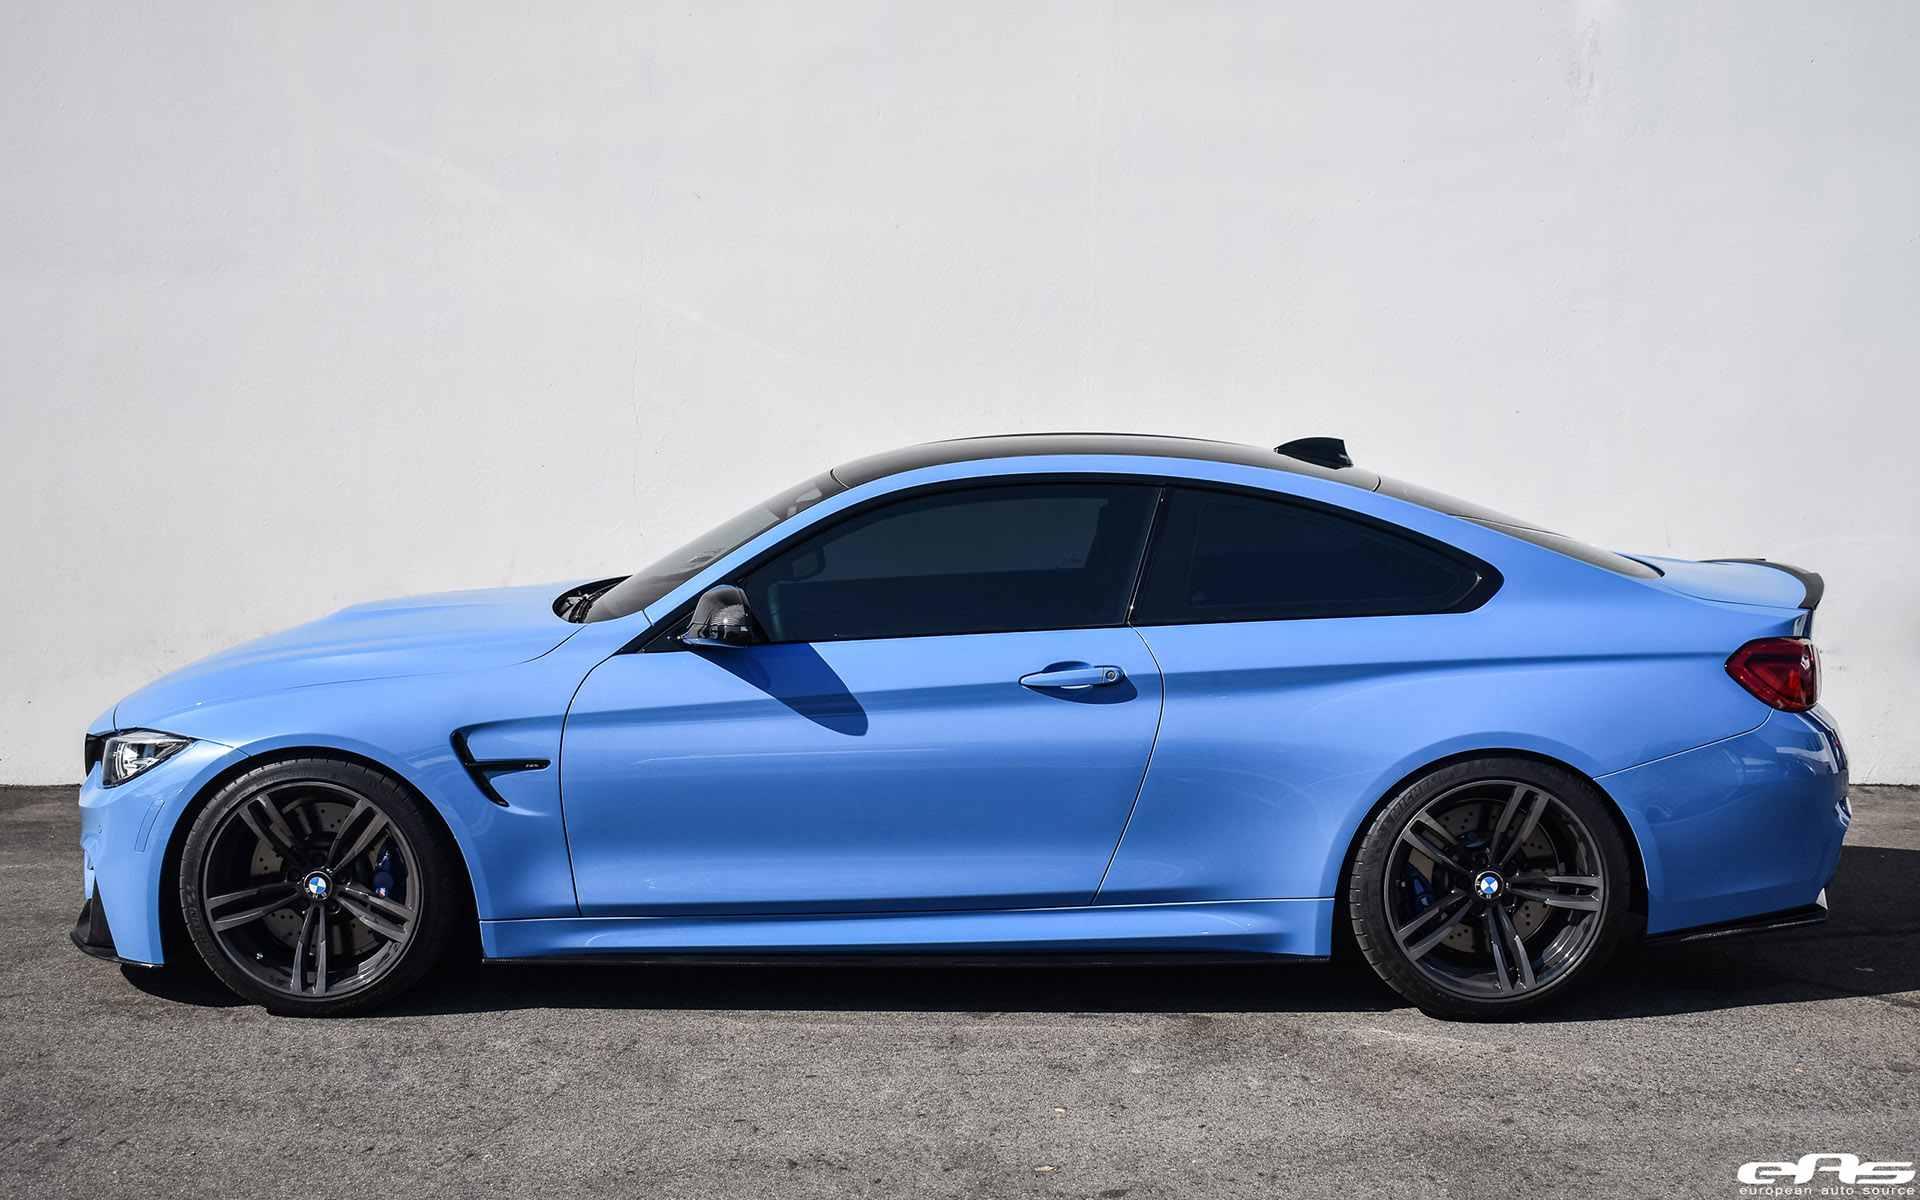 Yas Marina Blue BMW M4 by European Auto Source